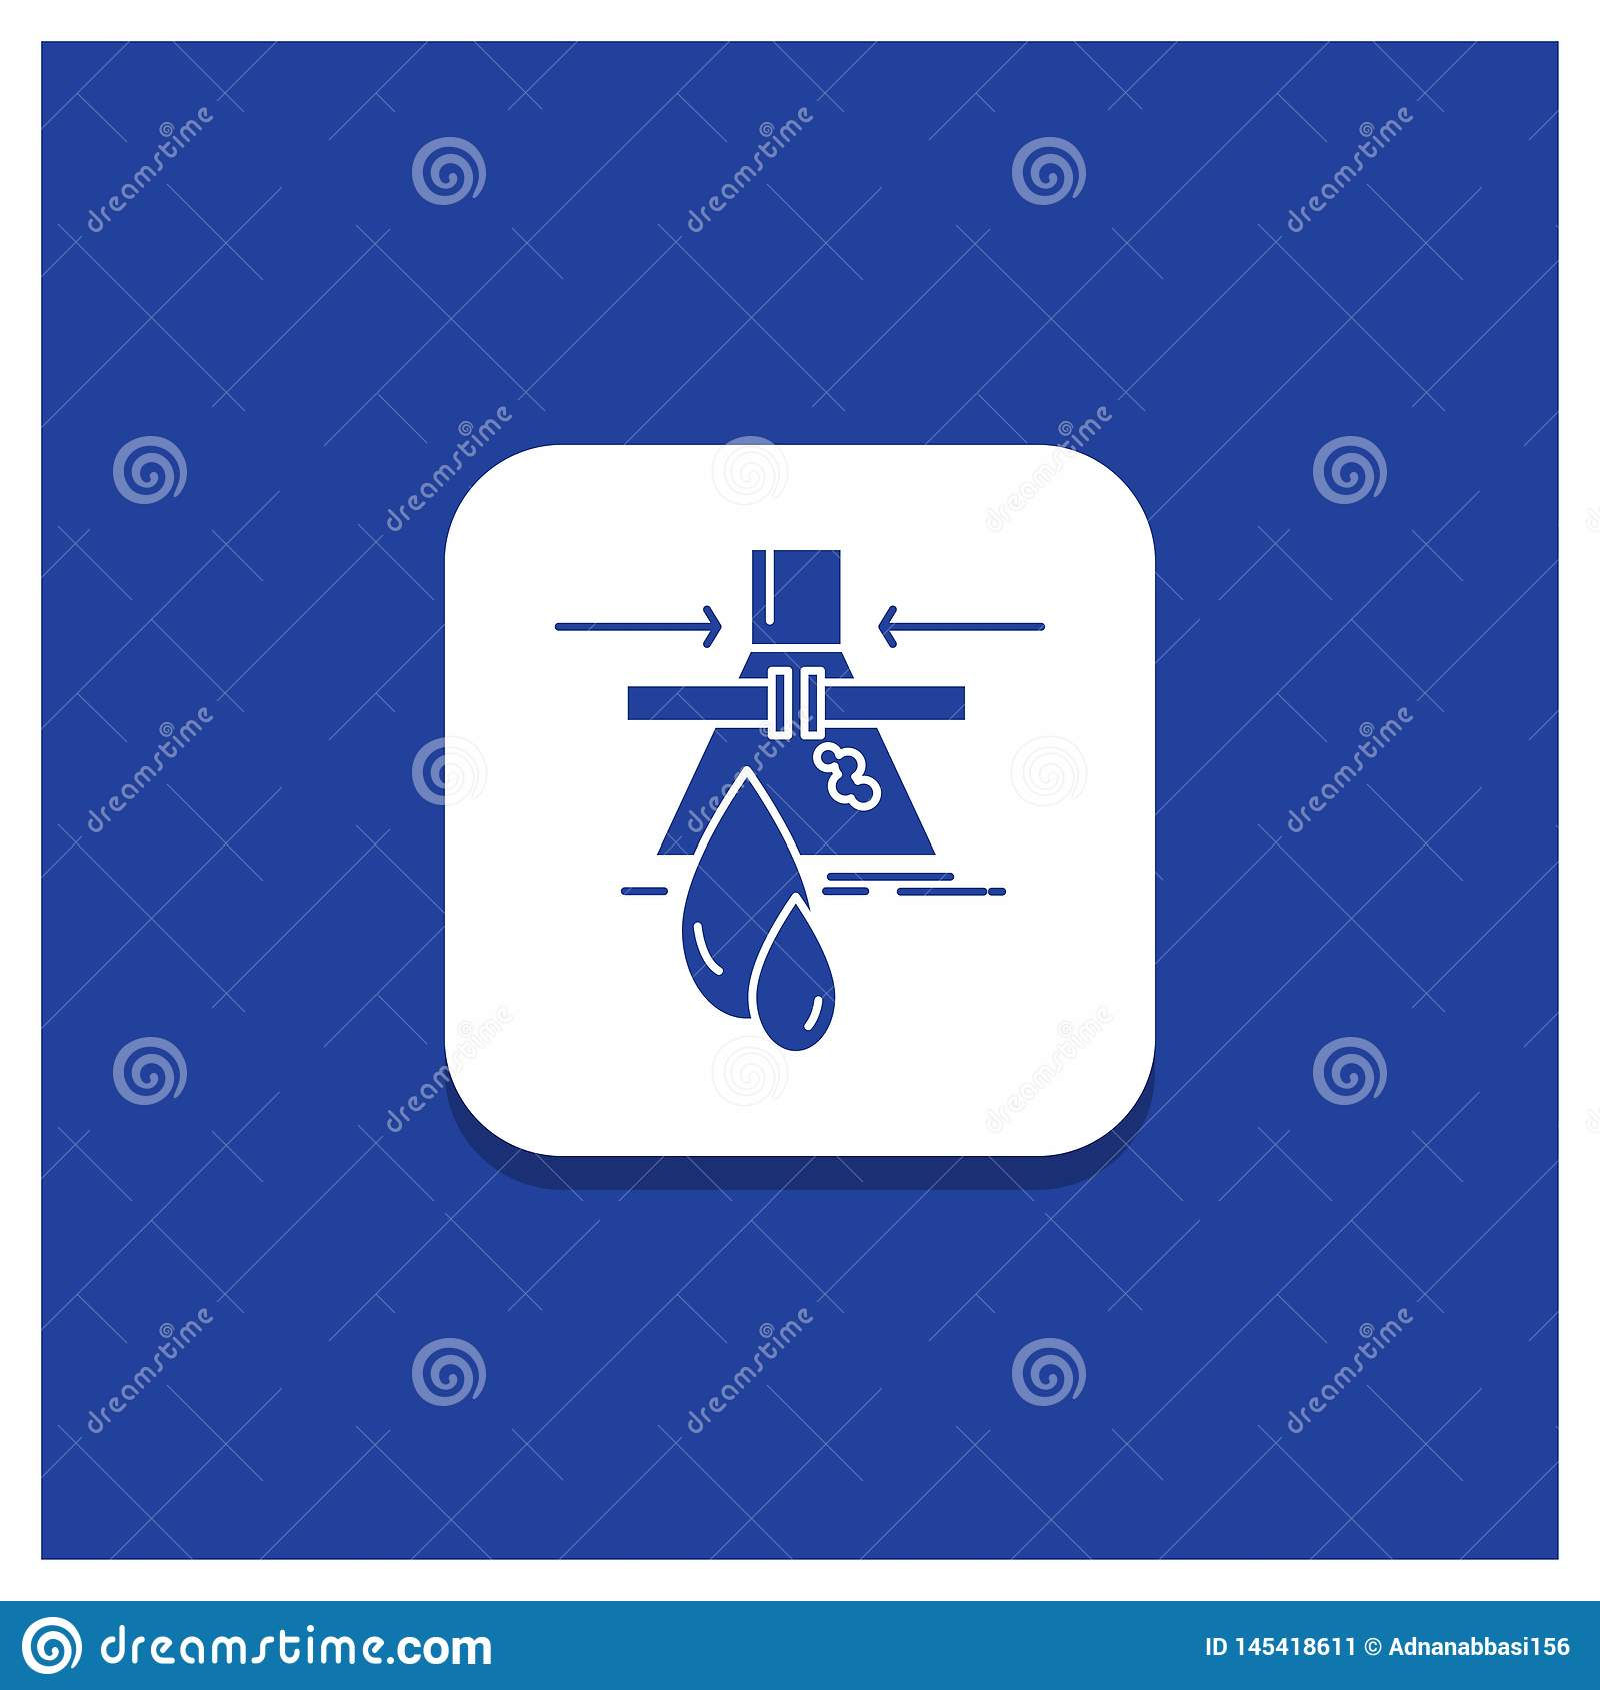 Голубая круглая кнопка для химиката, утечки, обнаружения, фабрики, значка глифа загрязнения